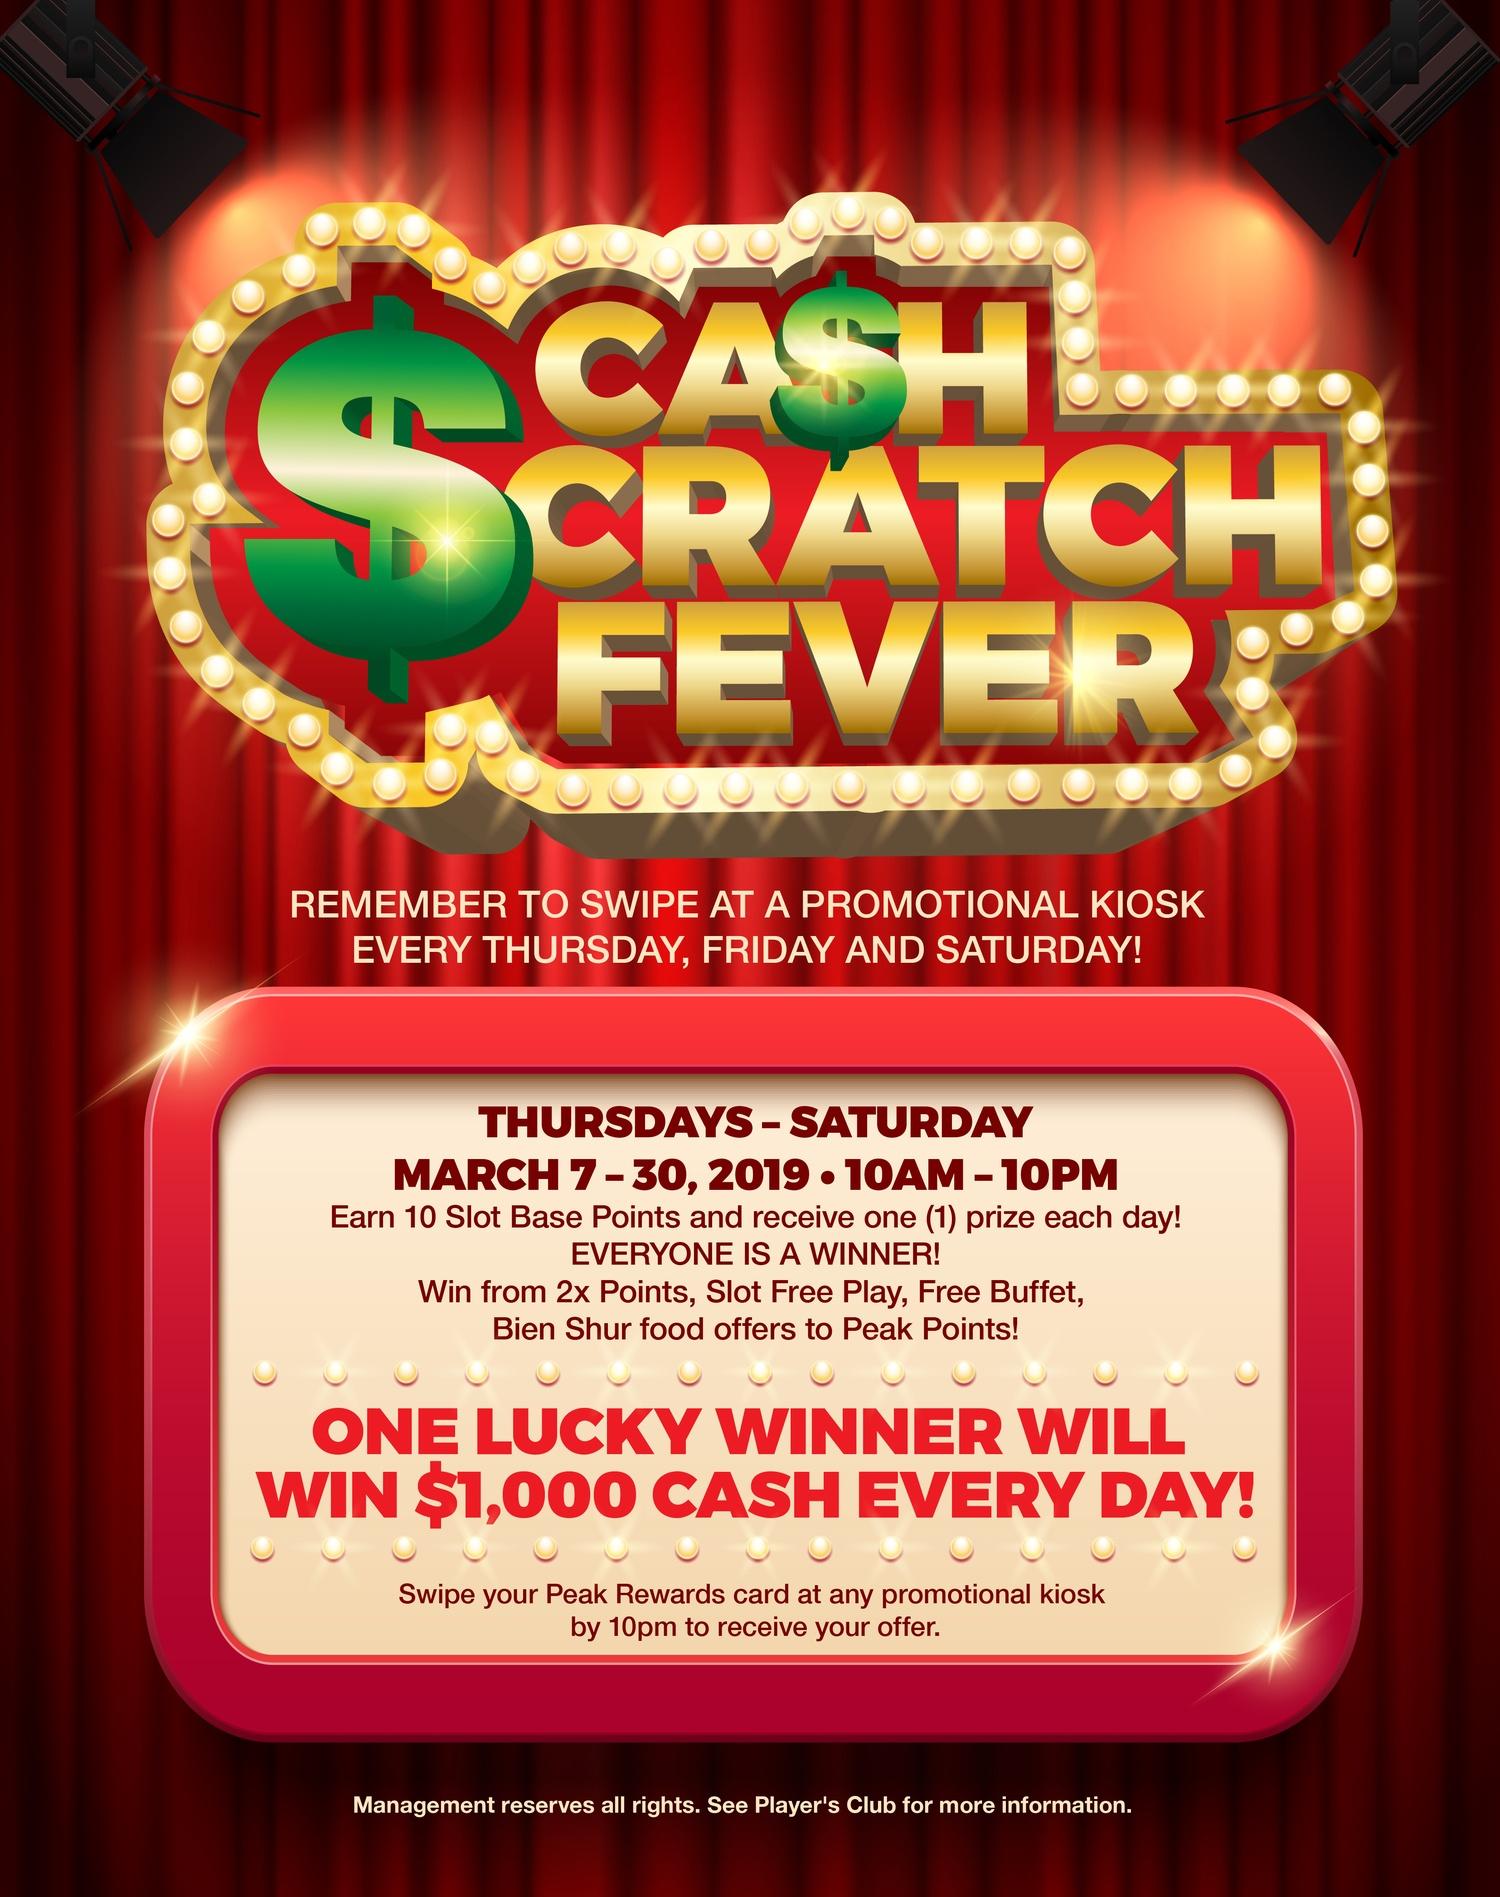 Cash Scratch Fever Promotion Gamble March